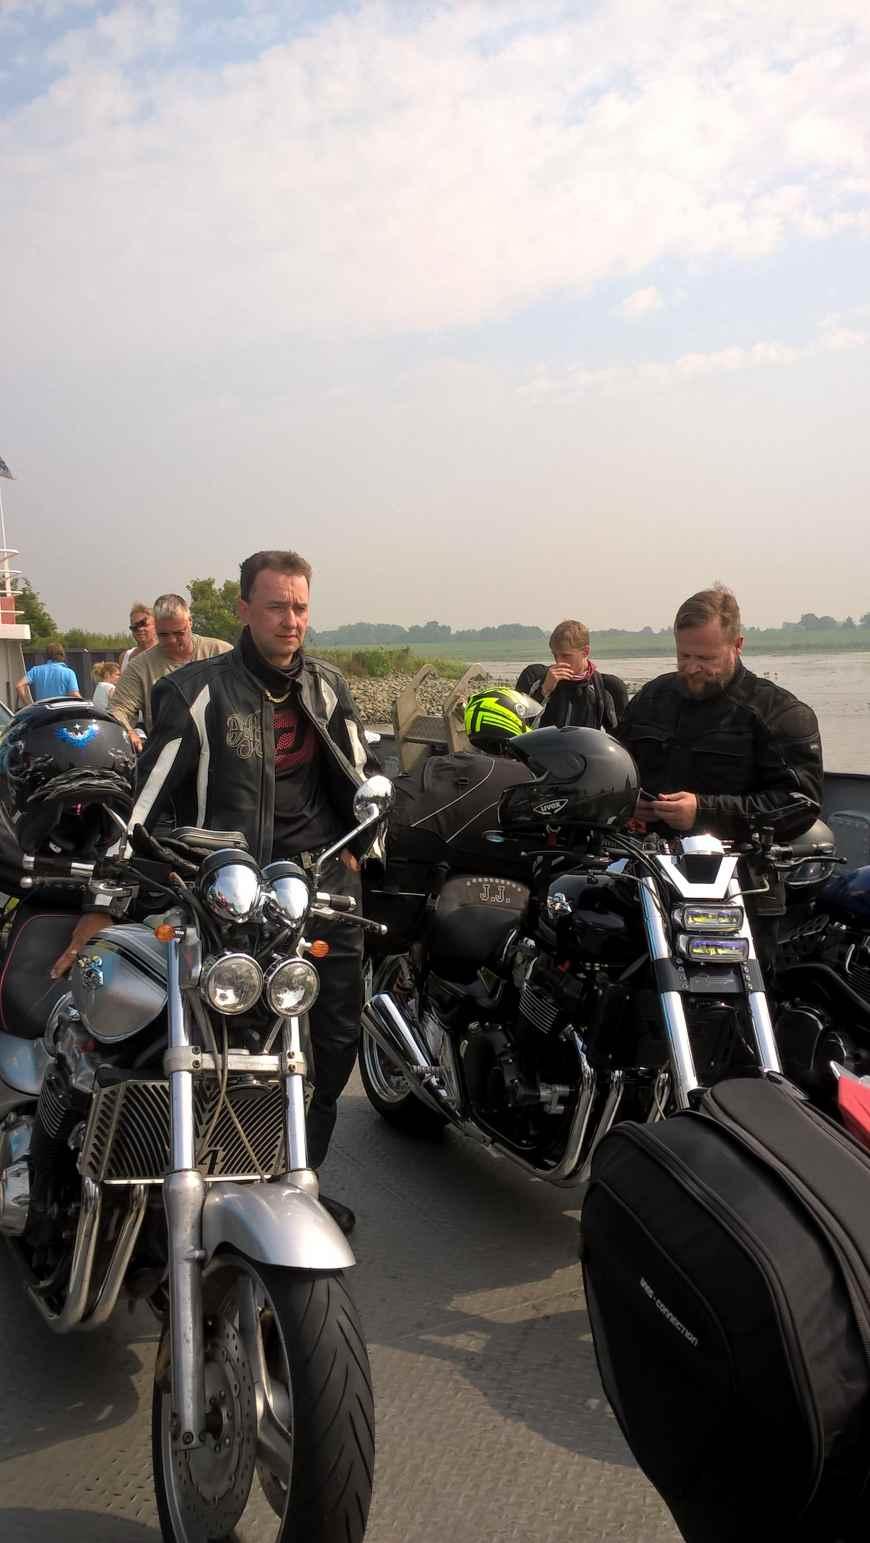 Elben ylitys lautalla